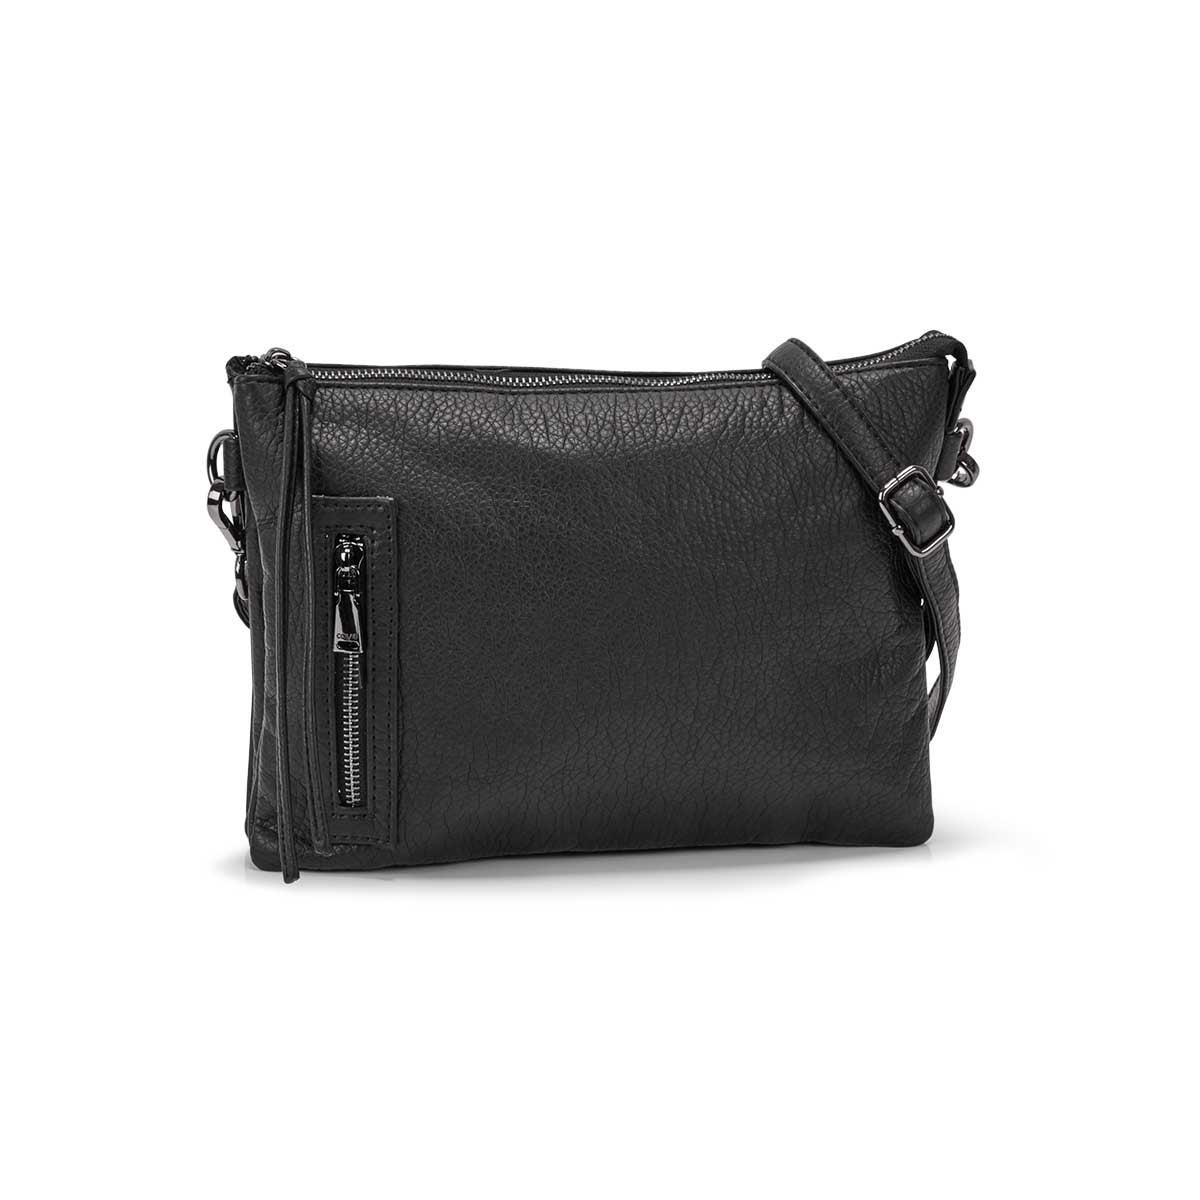 Women's LOFT FLAT black crossbody bag